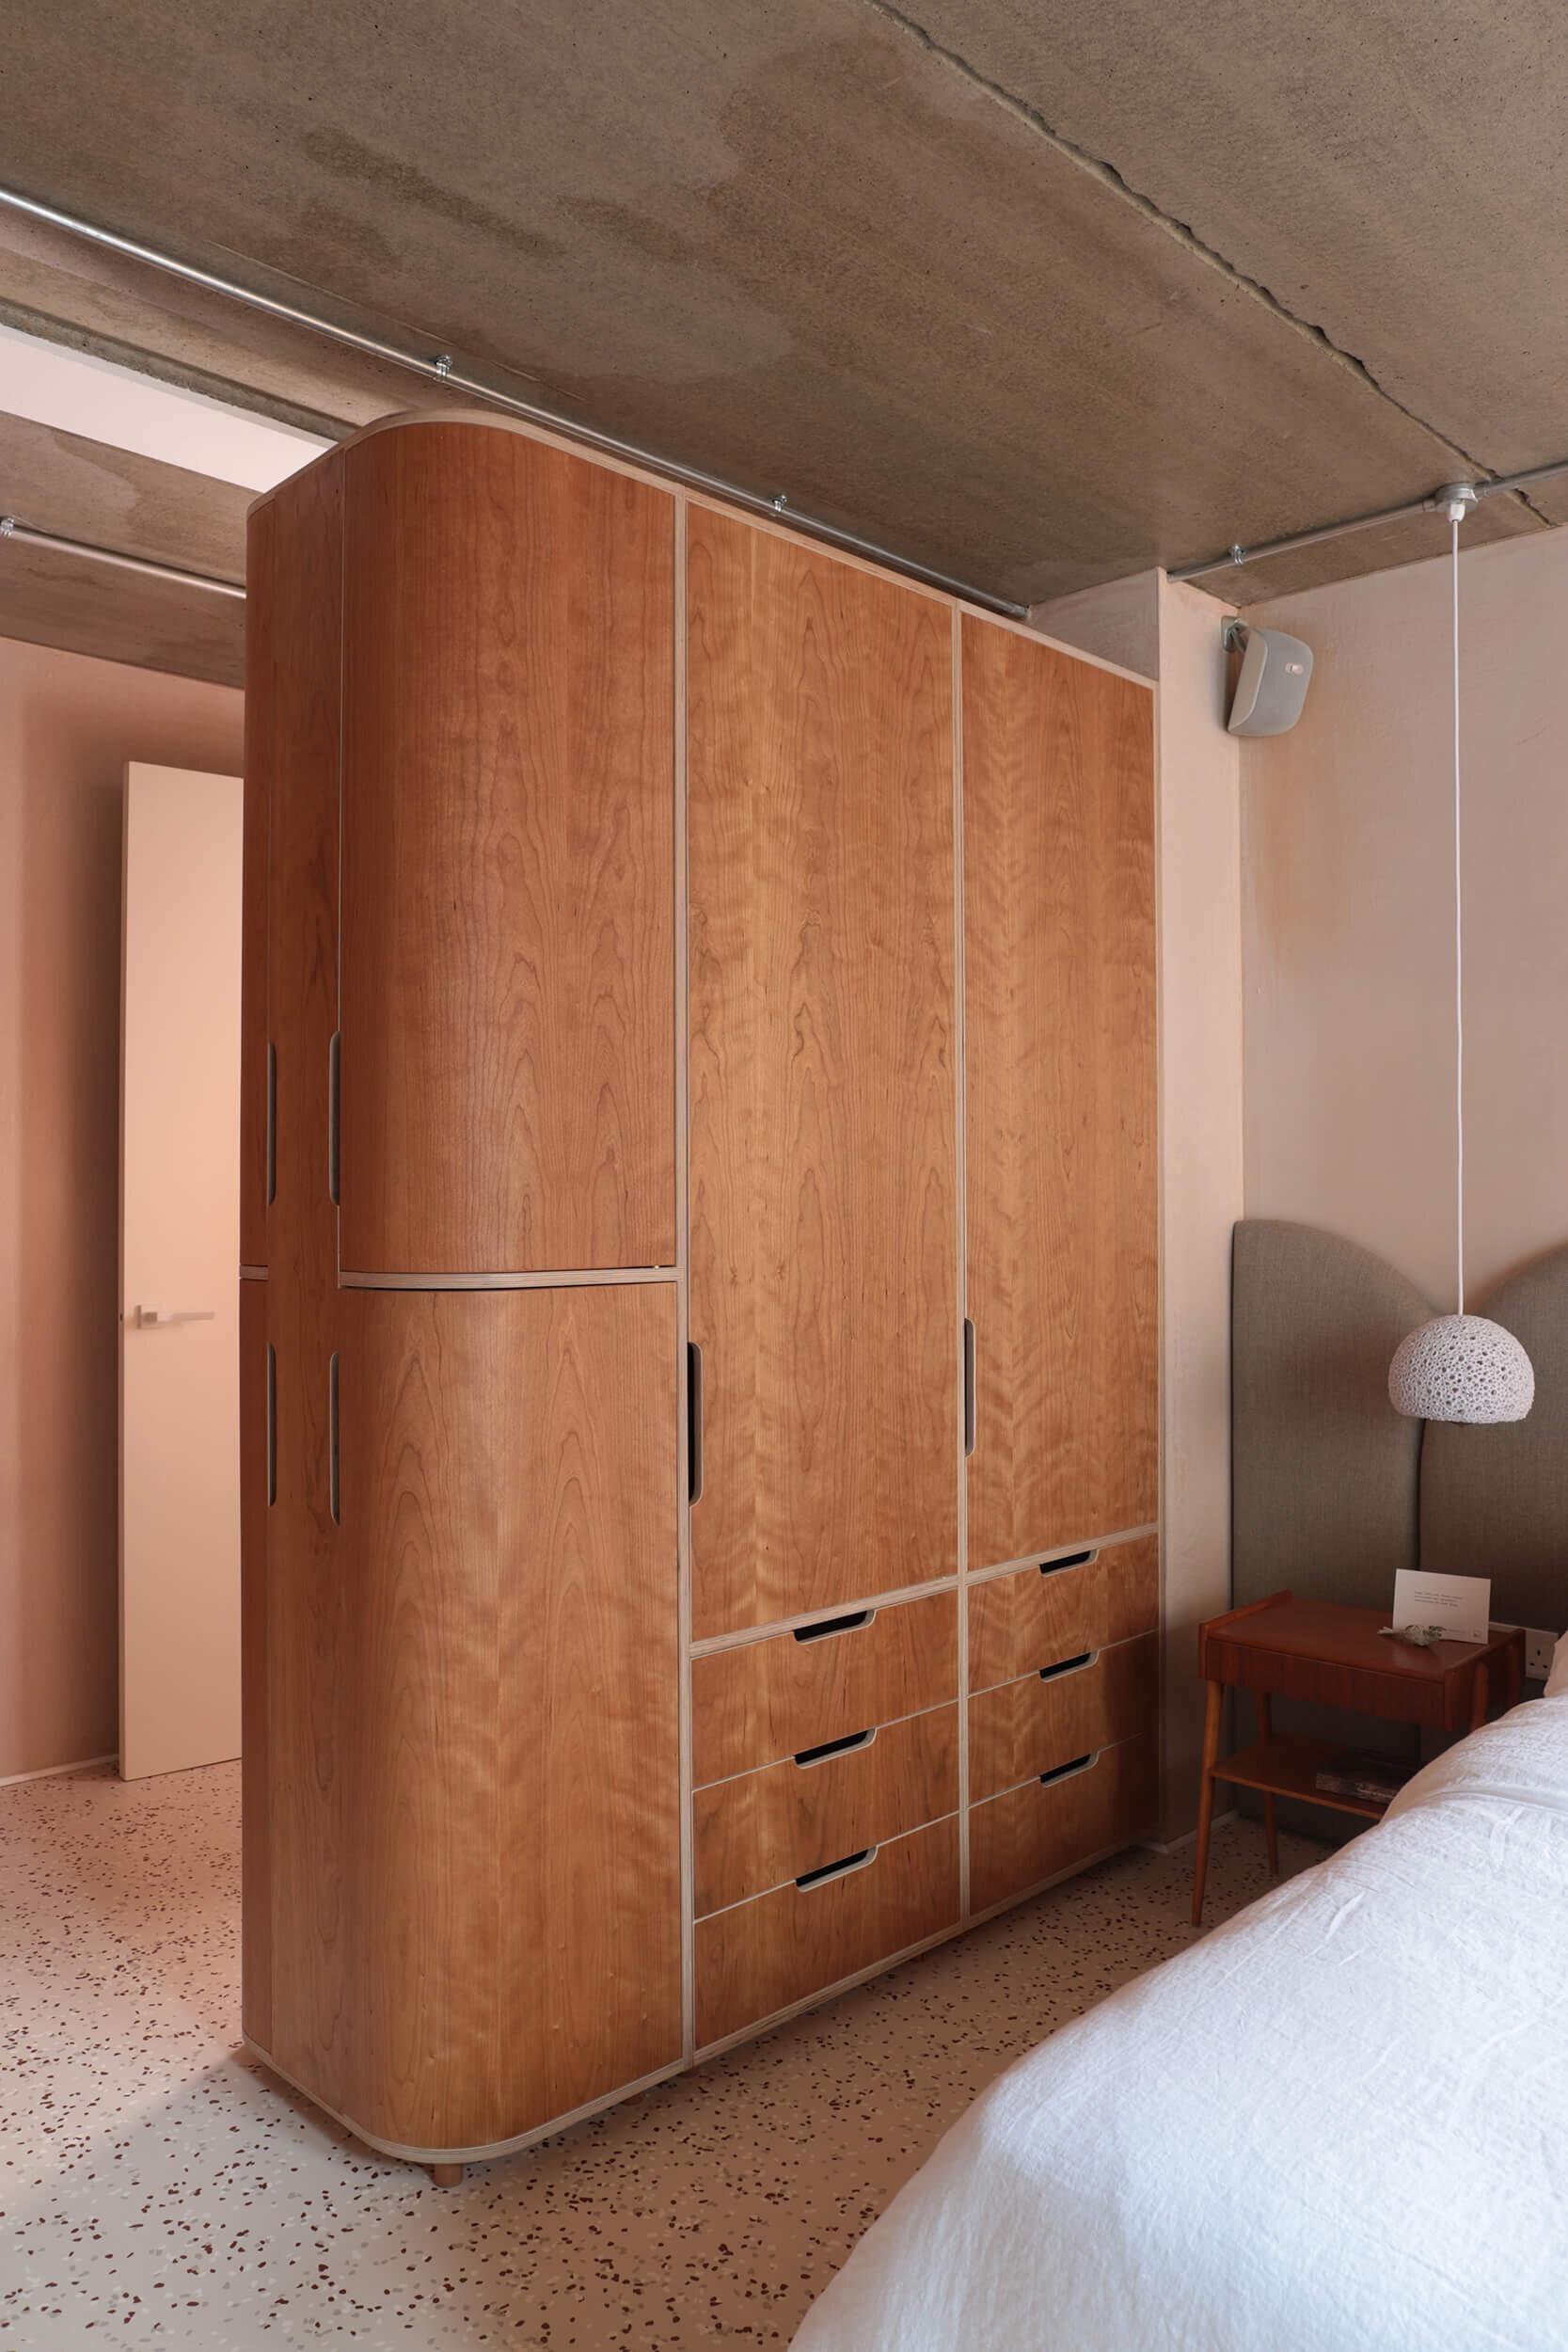 Bespoke Wardrobes Lozi Bespoke Plywood Furniture